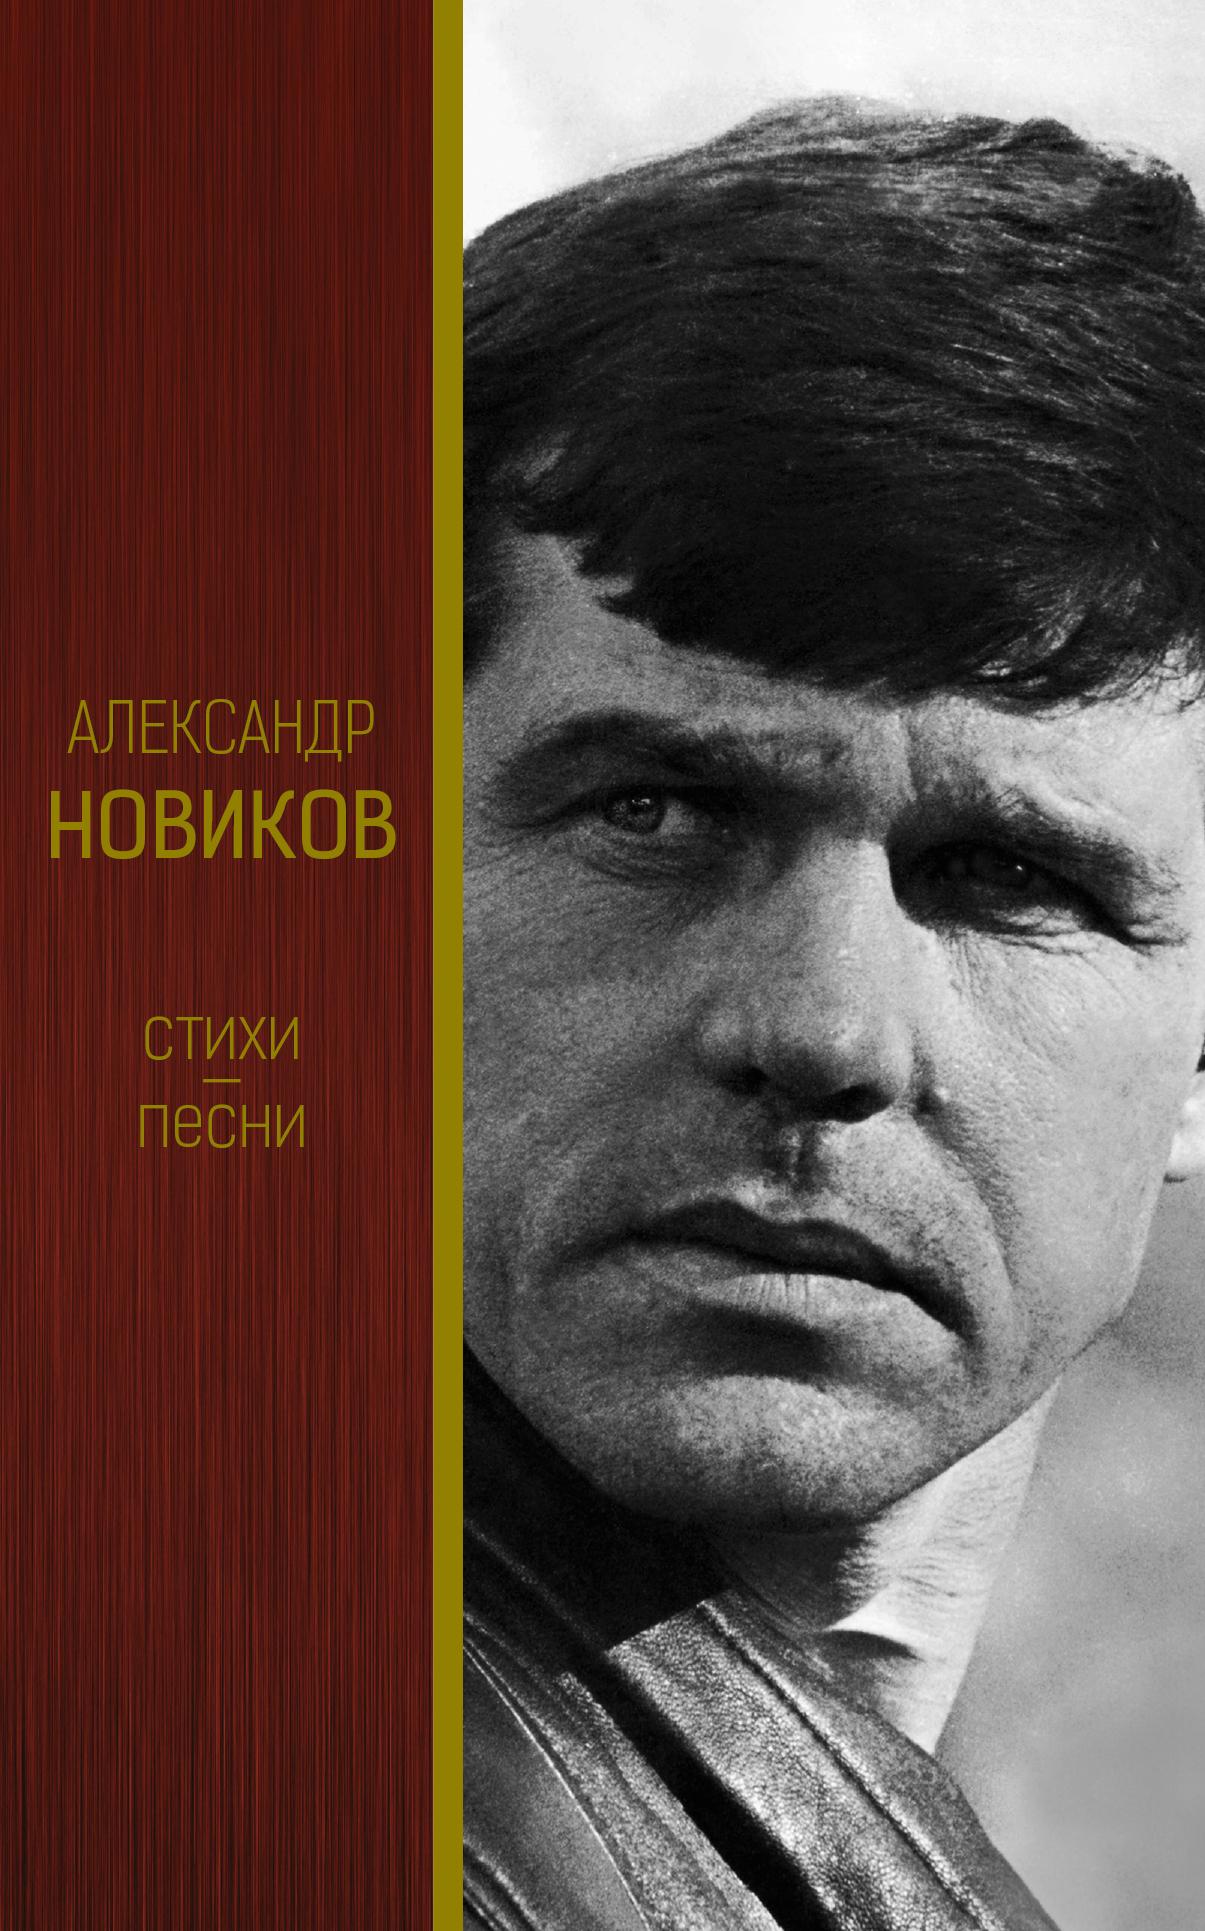 Александр Новиков Стихи. Песни александр новиков александр новиков диск 3 mp3